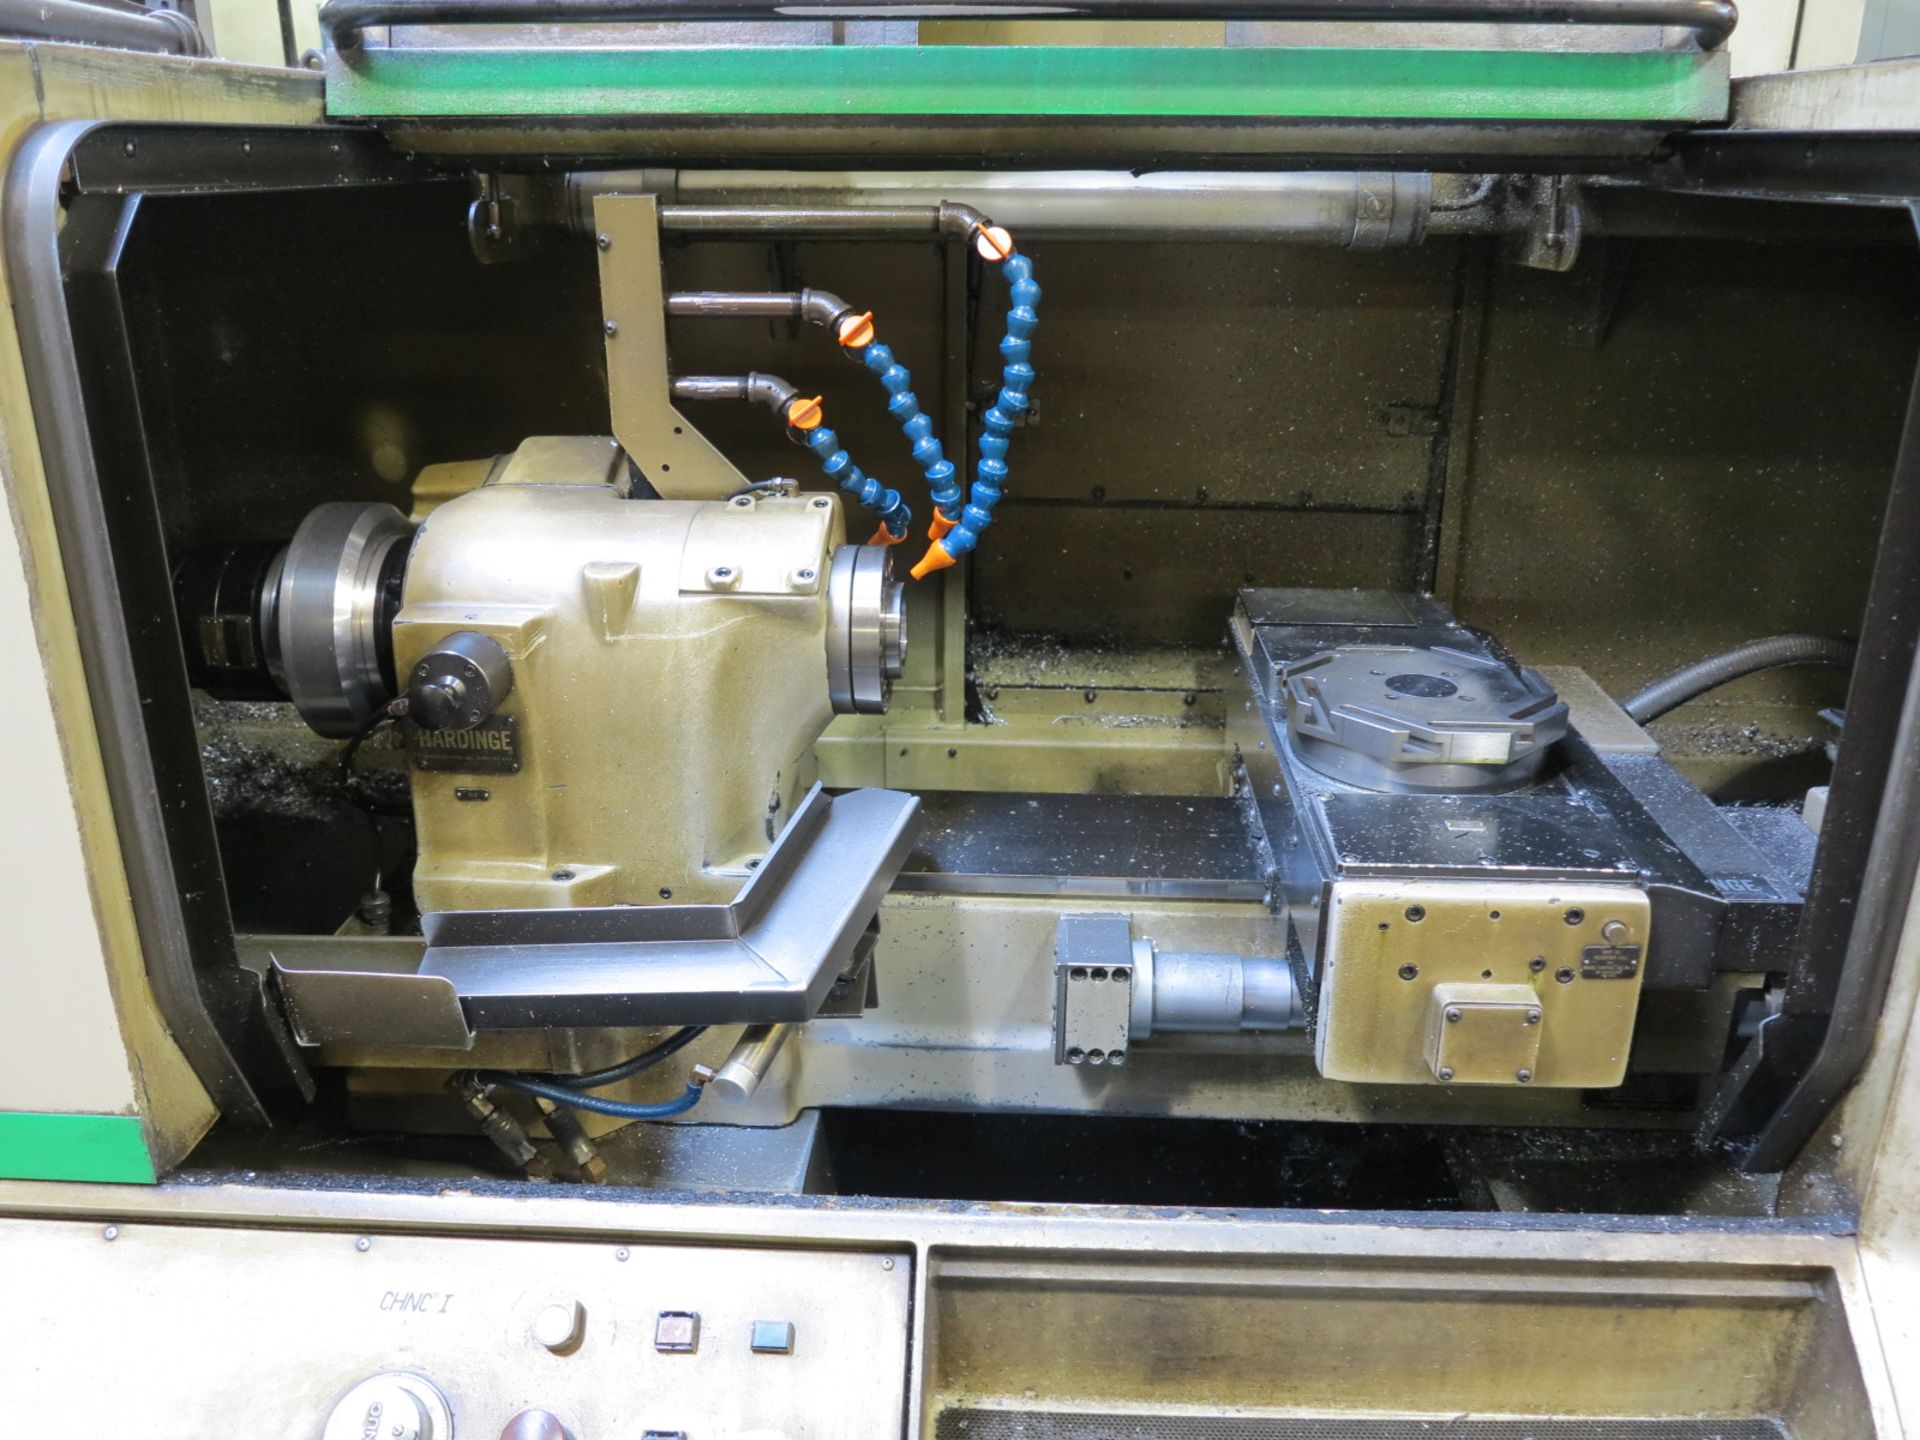 HARDINGE CHNC-I CNC LATHE, GE FANUC OT CNC CONTROL, SPACE TURN BARFEED, S/N CN-4276T - Image 16 of 16